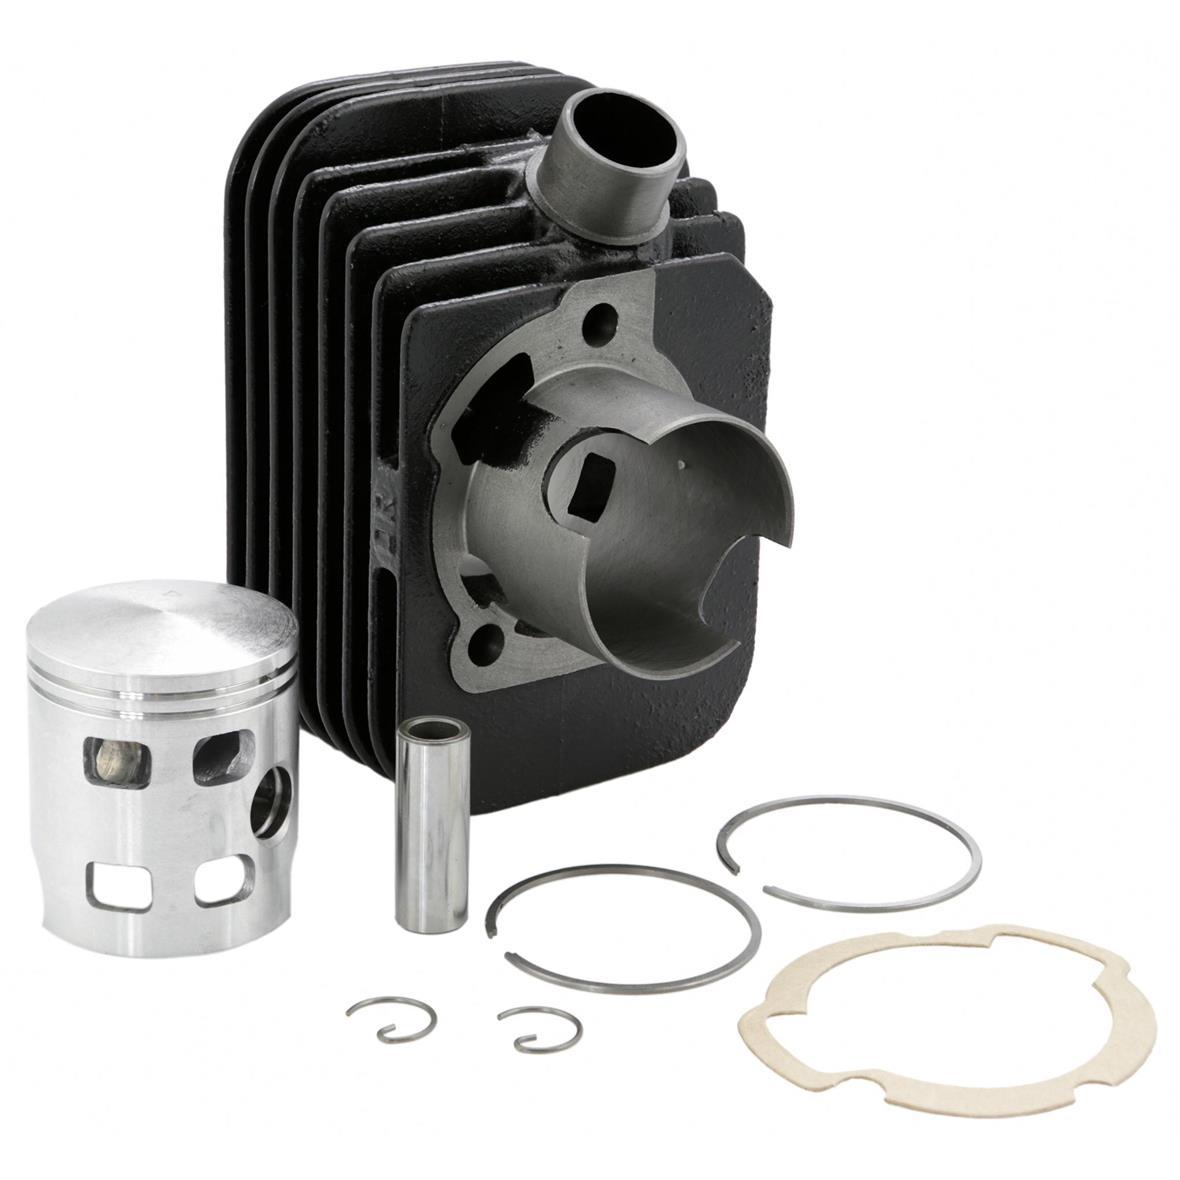 Zdjęcie produktu dla 'Cylinder rajdowy D.R. 63 ccmTitle'